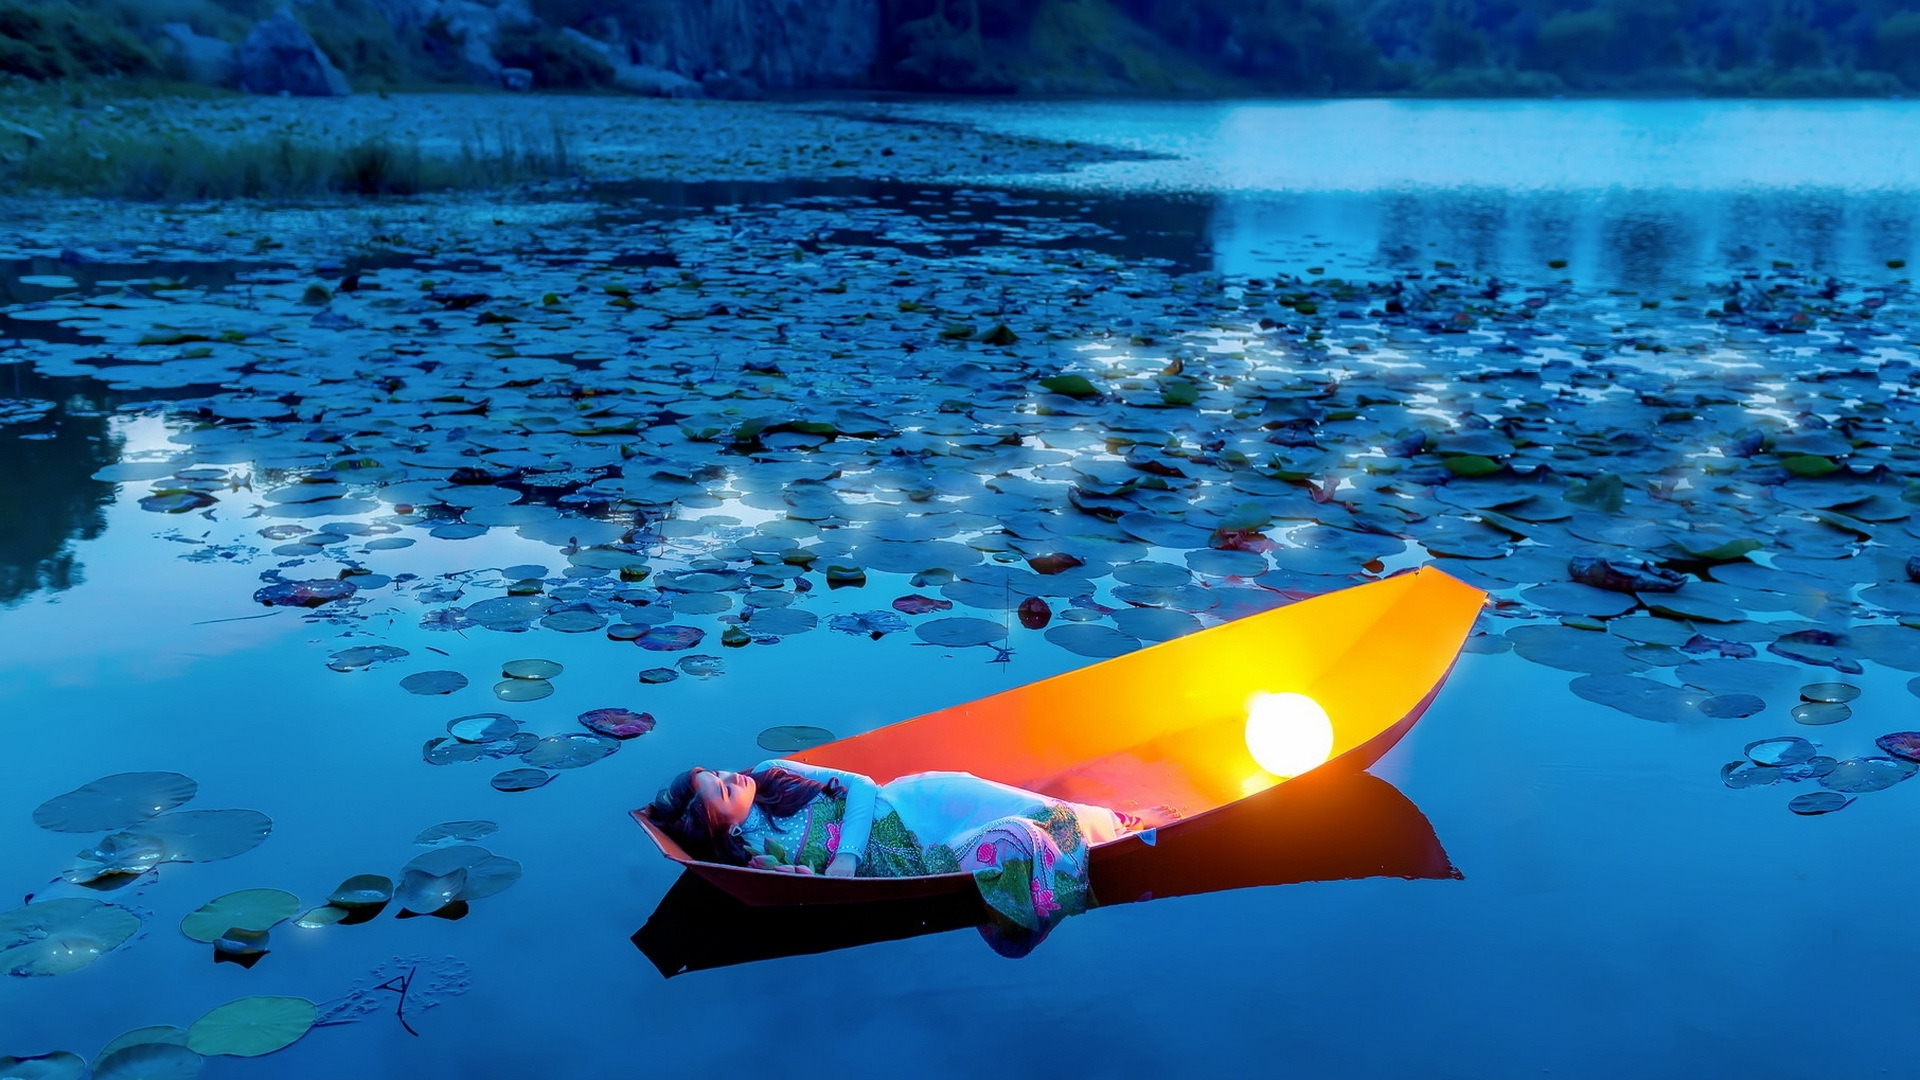 woman-in-a-boat-26497